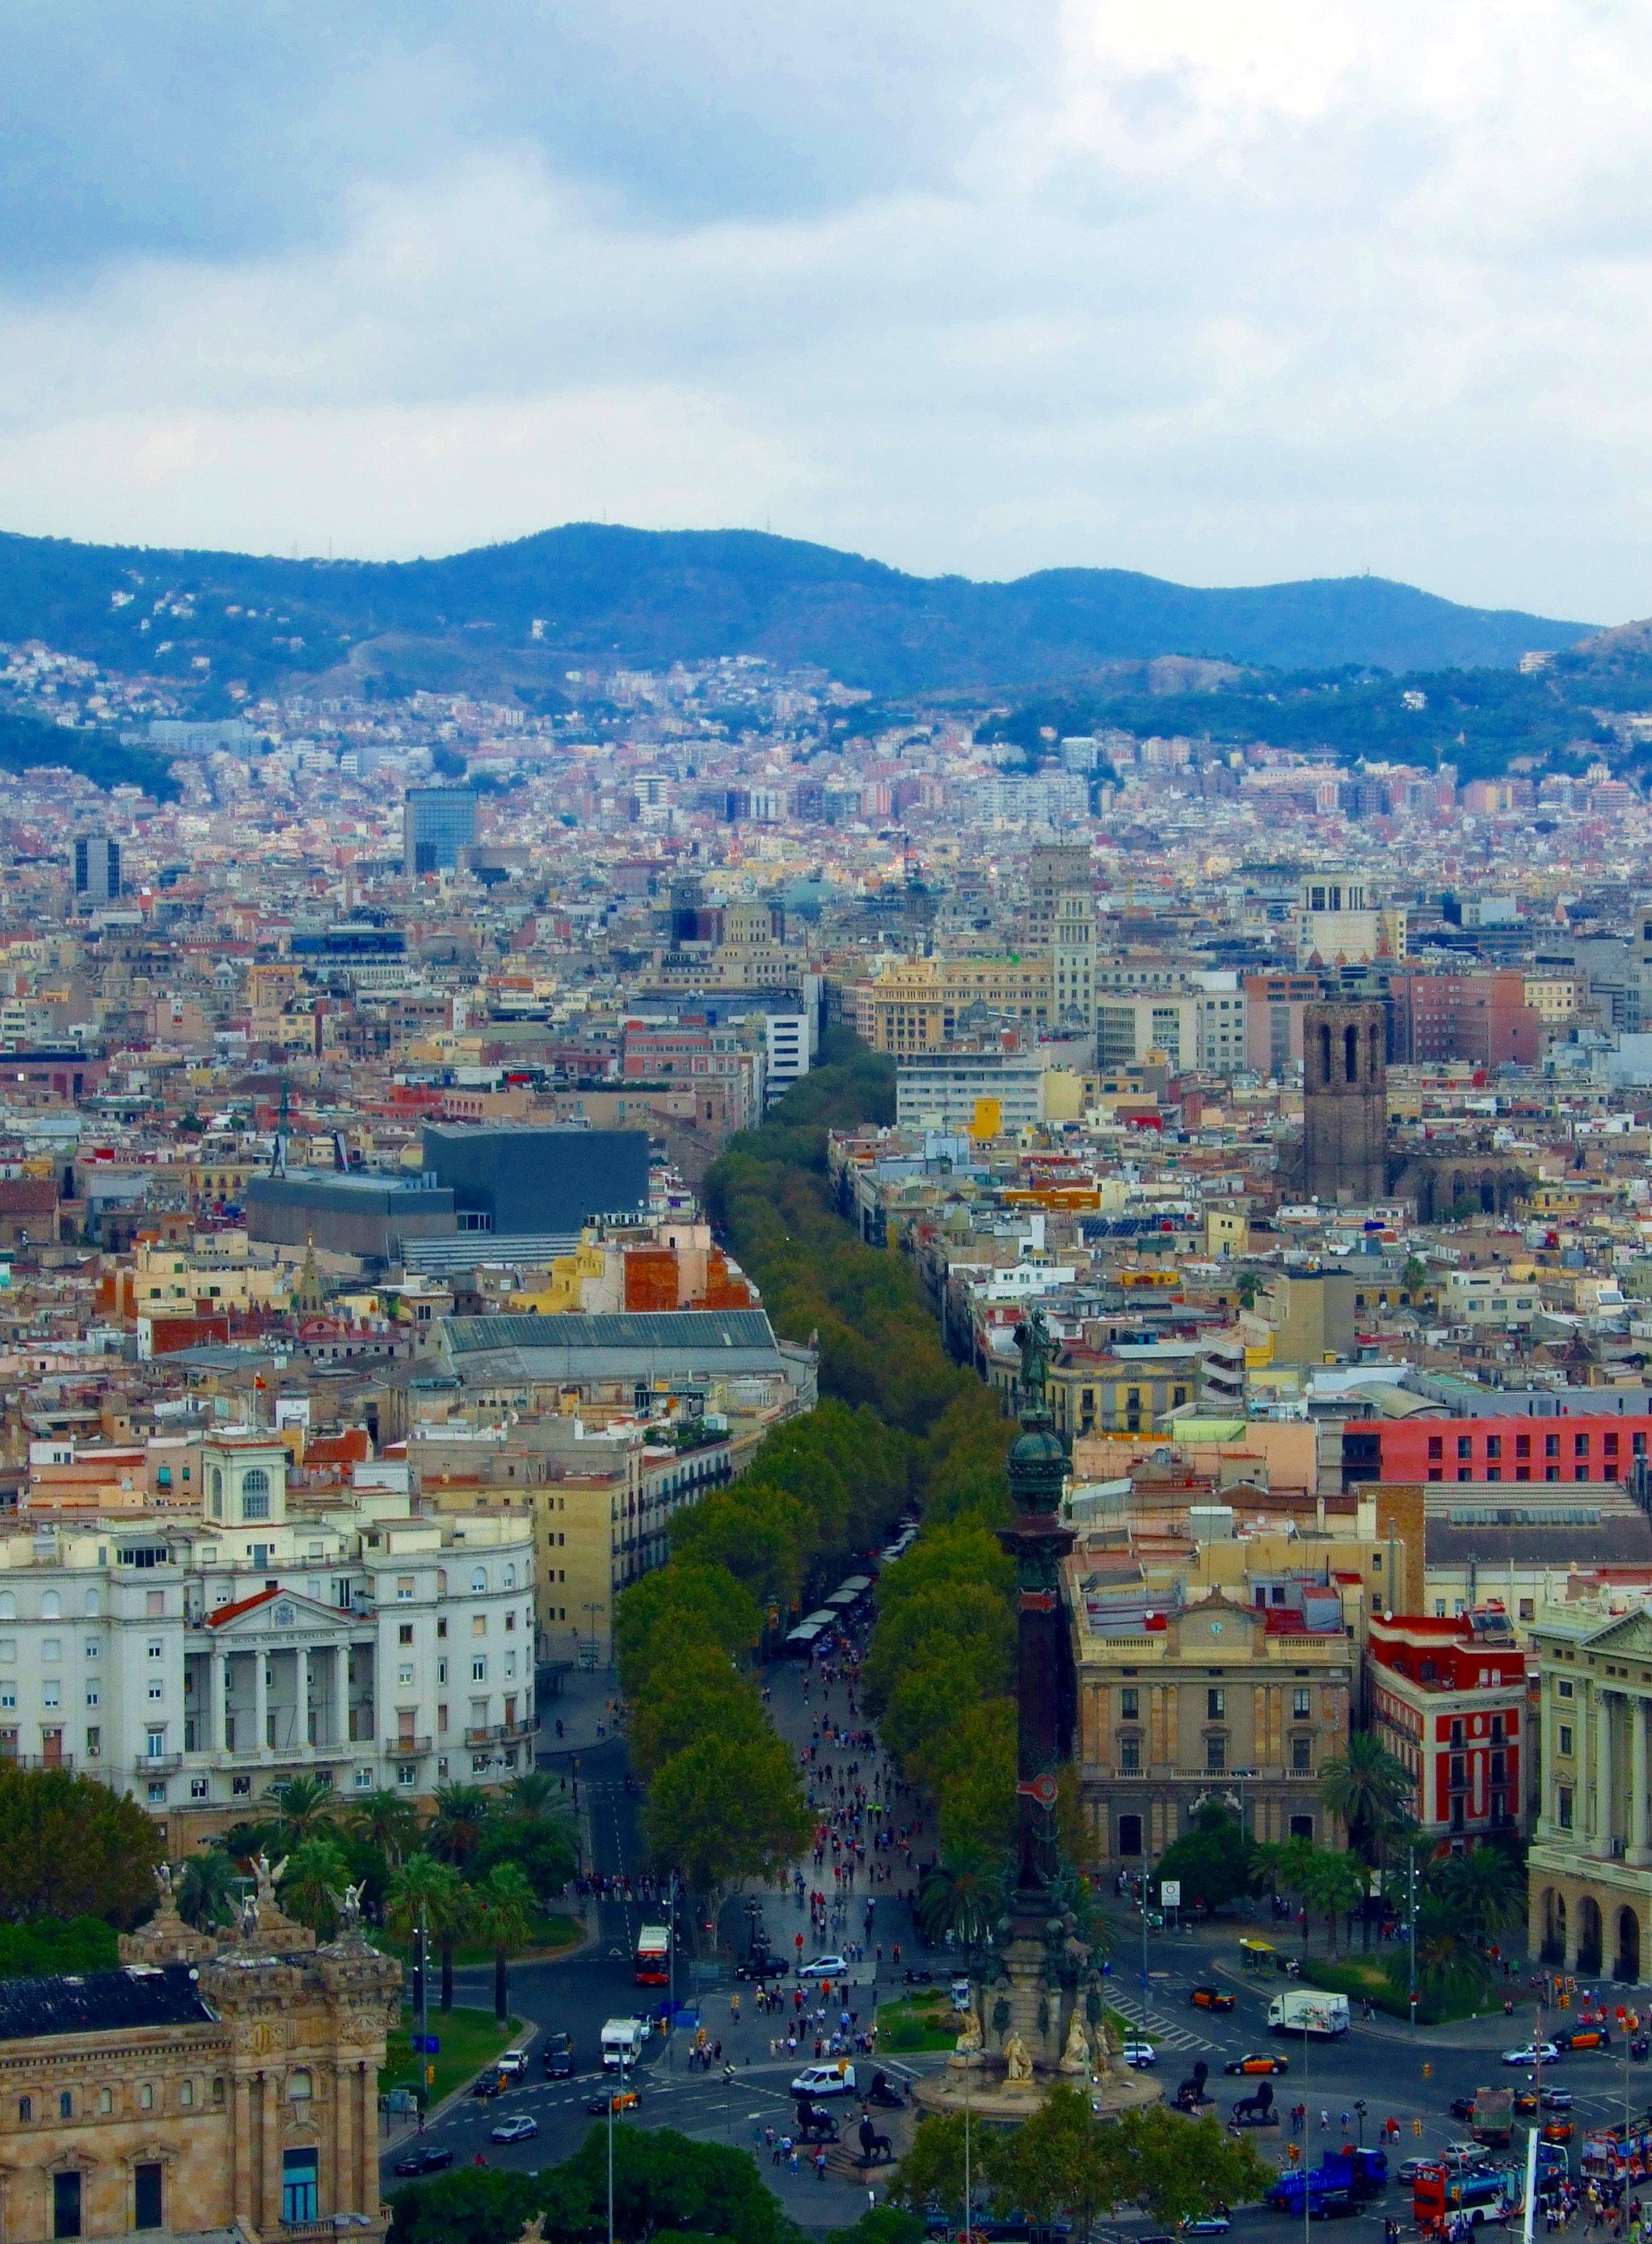 Ramblas Barcelona Wikipedia images